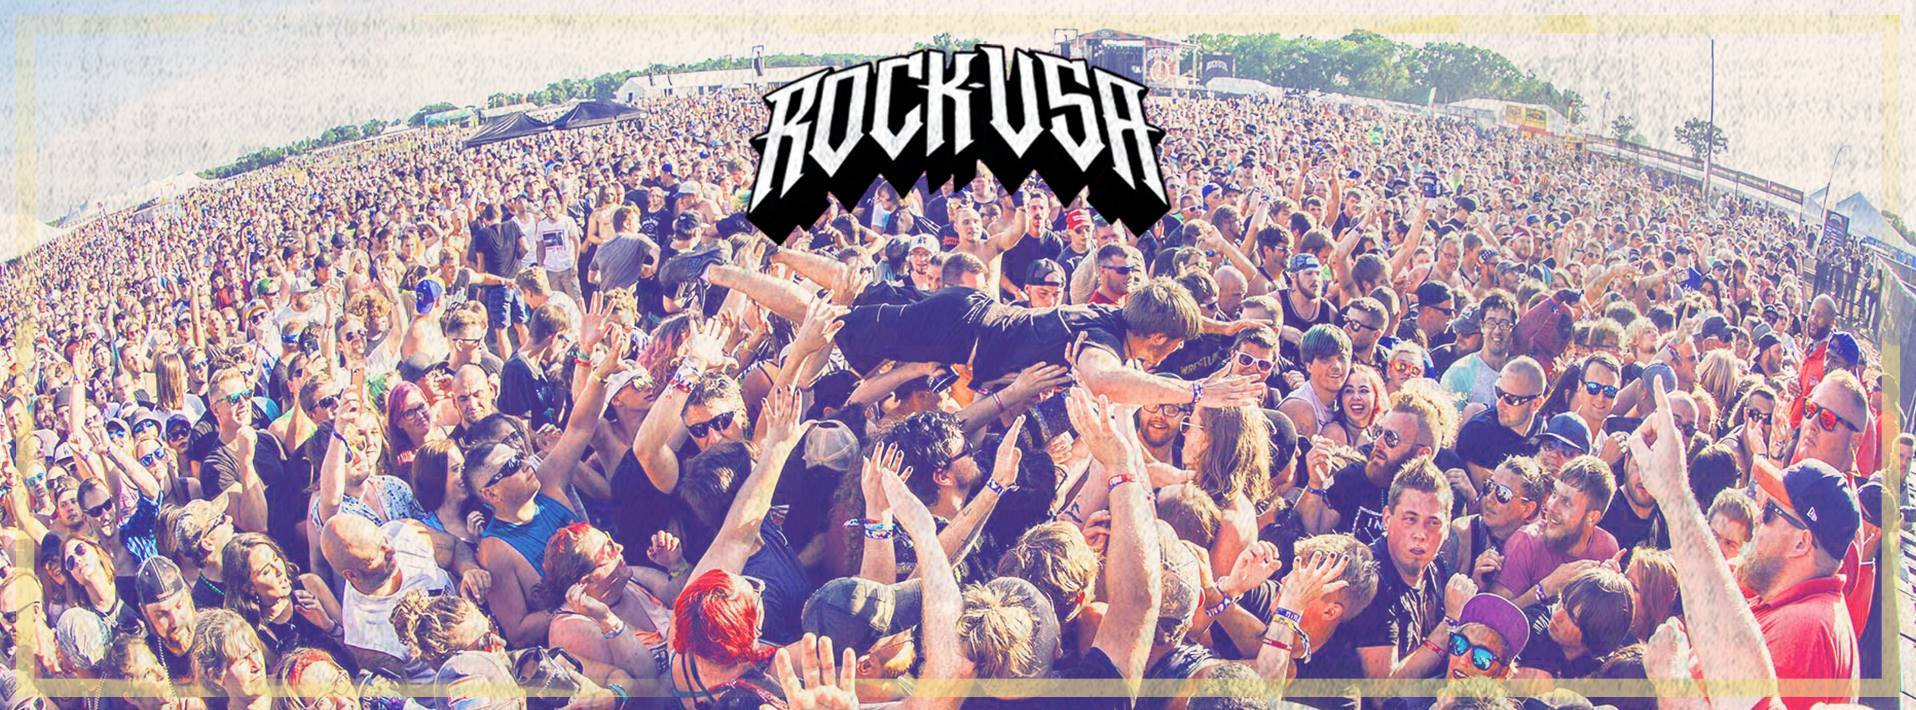 Upcoming Metal Music Festivals